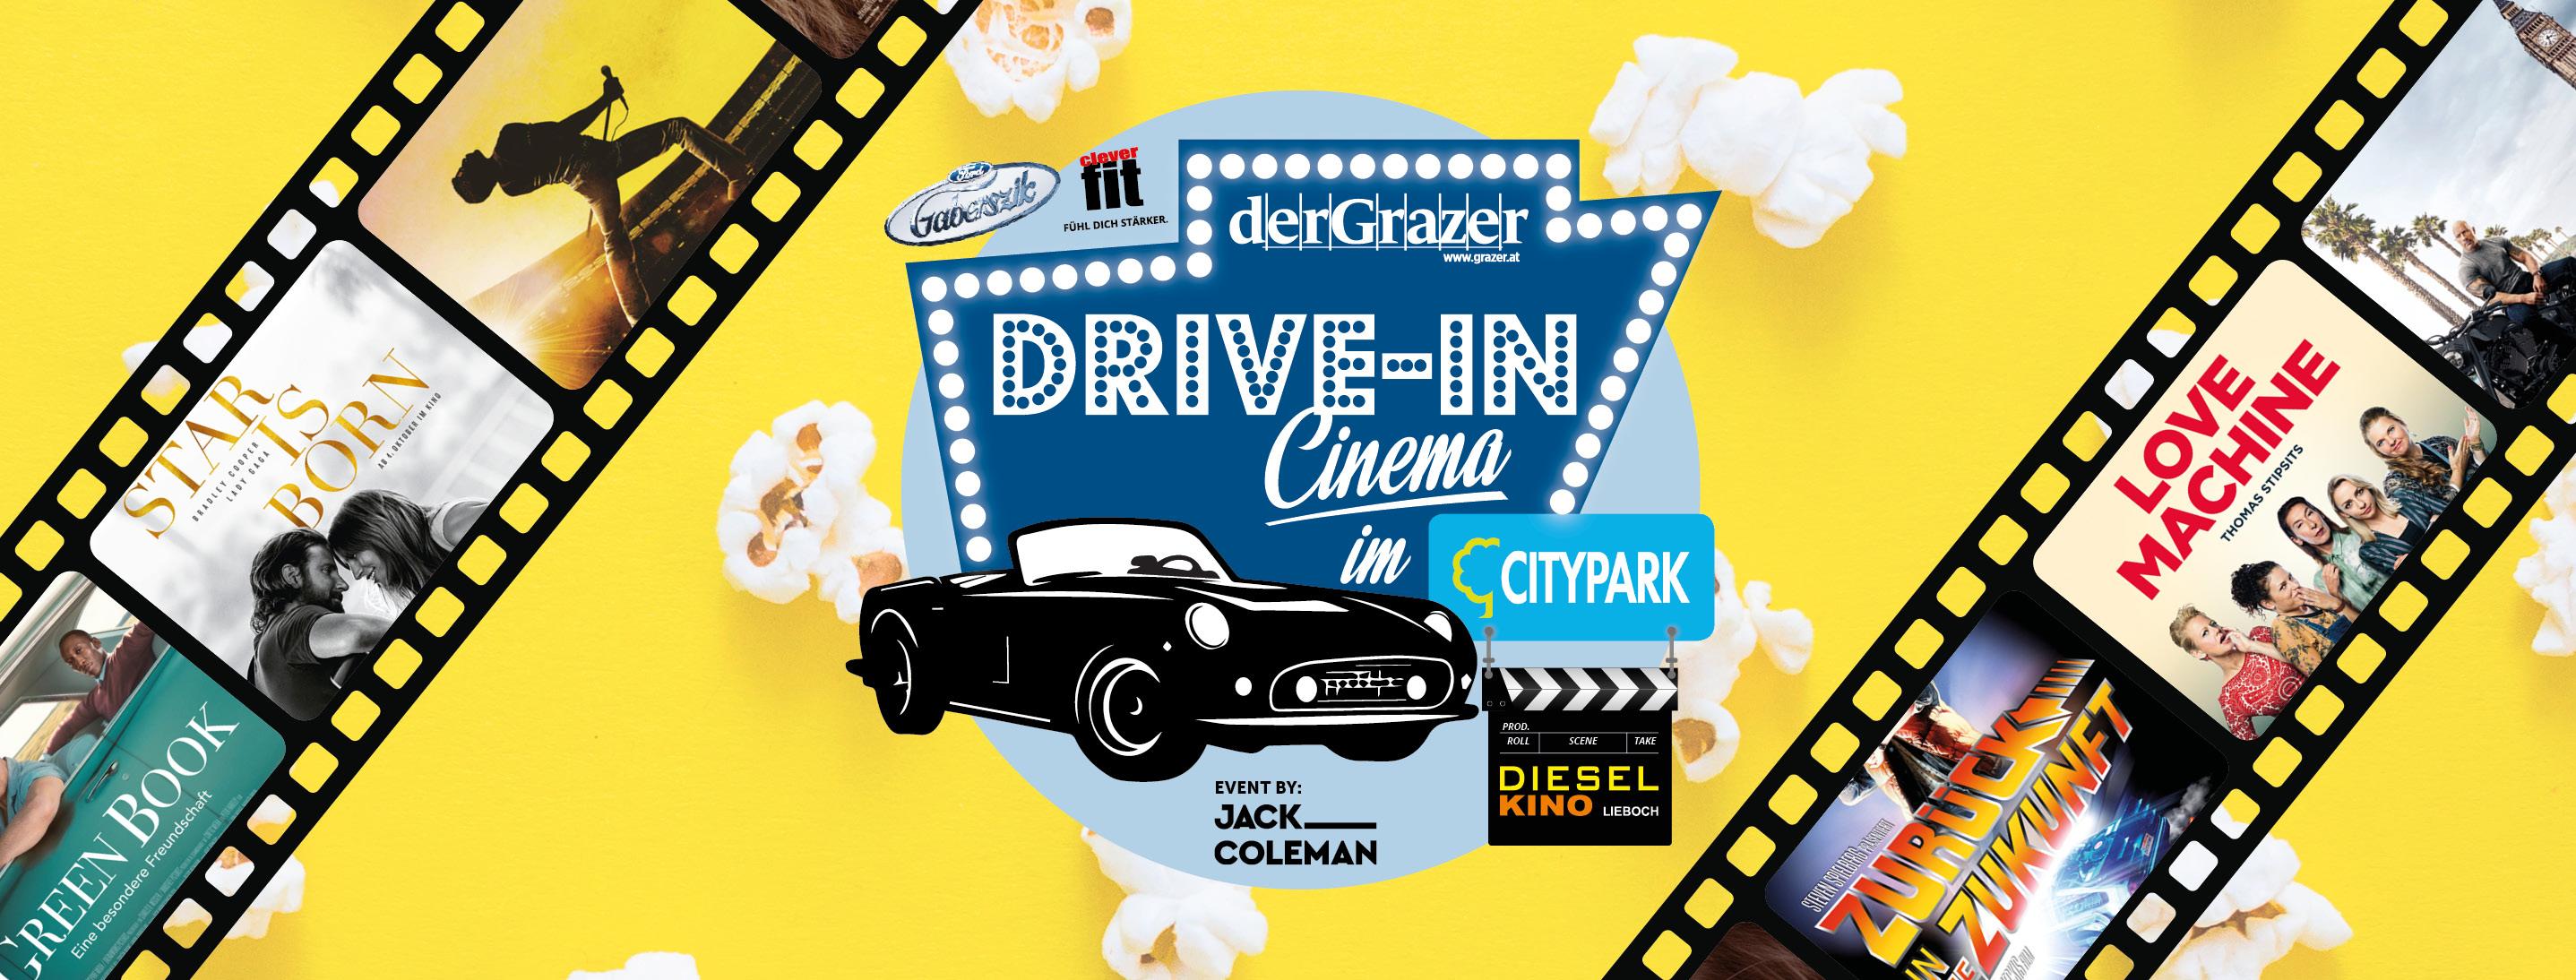 Drive-In-Cinema-Autokino-Graz-Jack-Coleman-Citypark-Grazer-Movies-Ford-Gaberszik